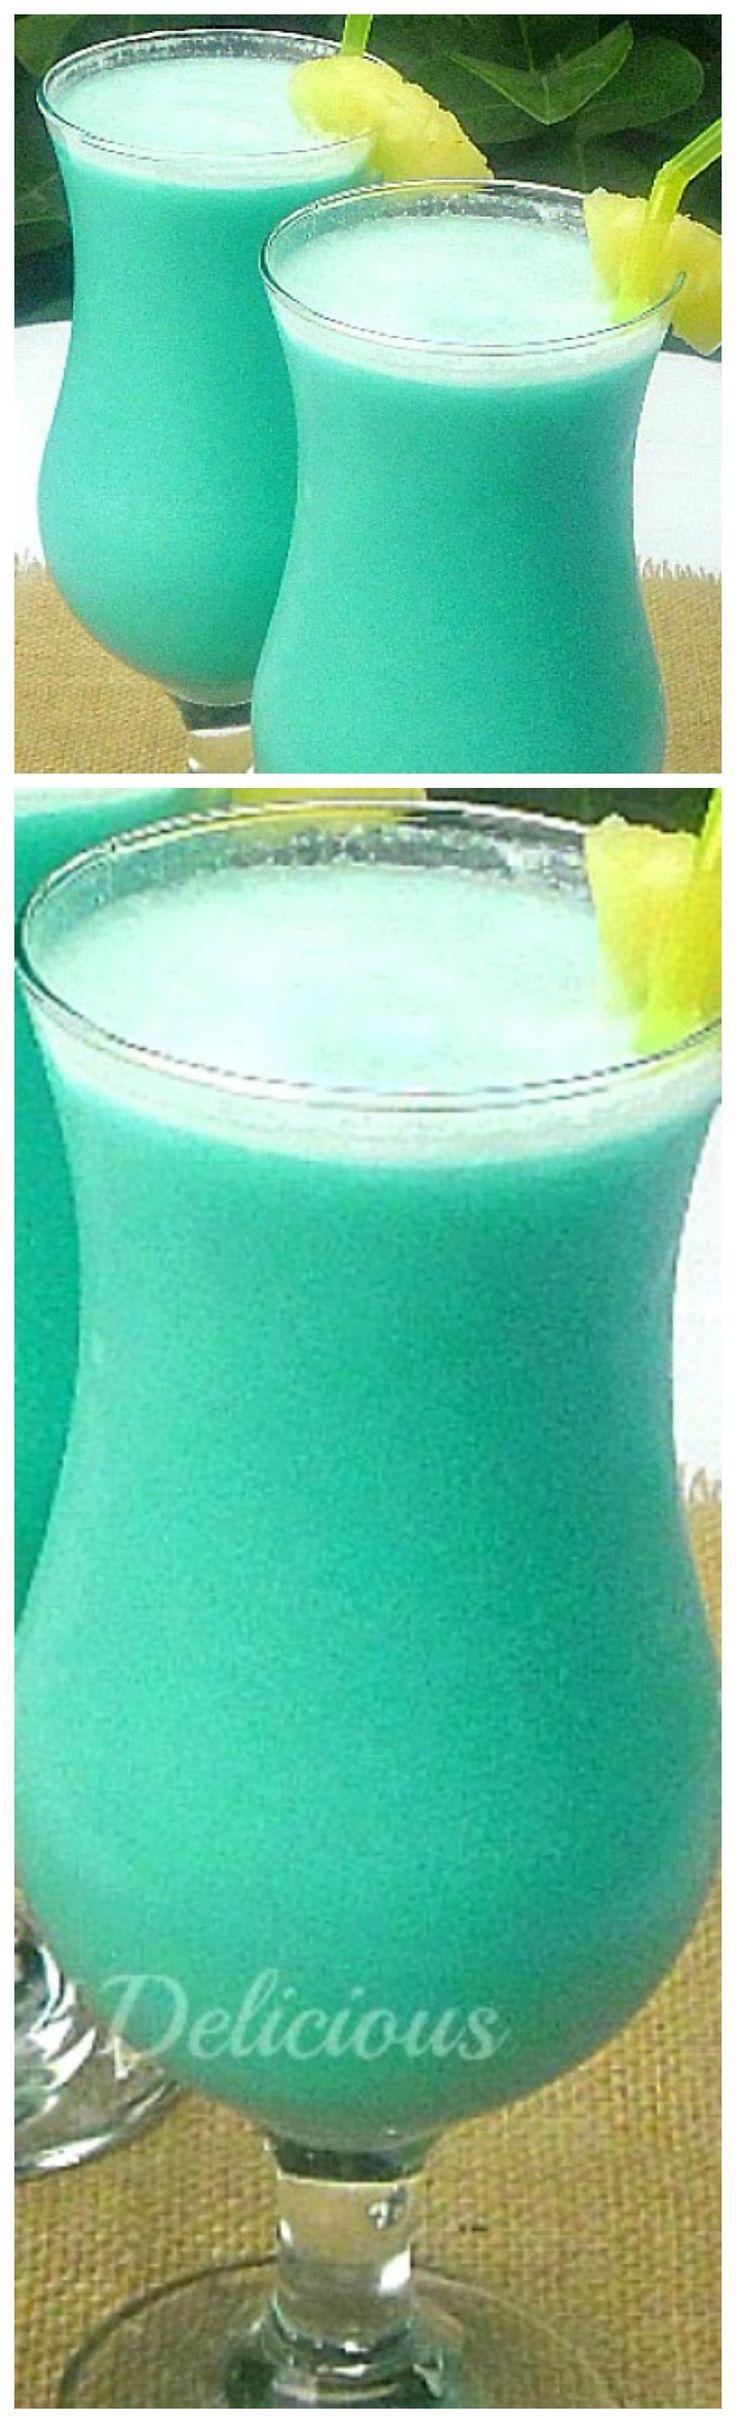 Blue Hawaiian Cocktail ~ Blue Curacao, Coconut Cream, White Rum, Fresh Pineapple Juice